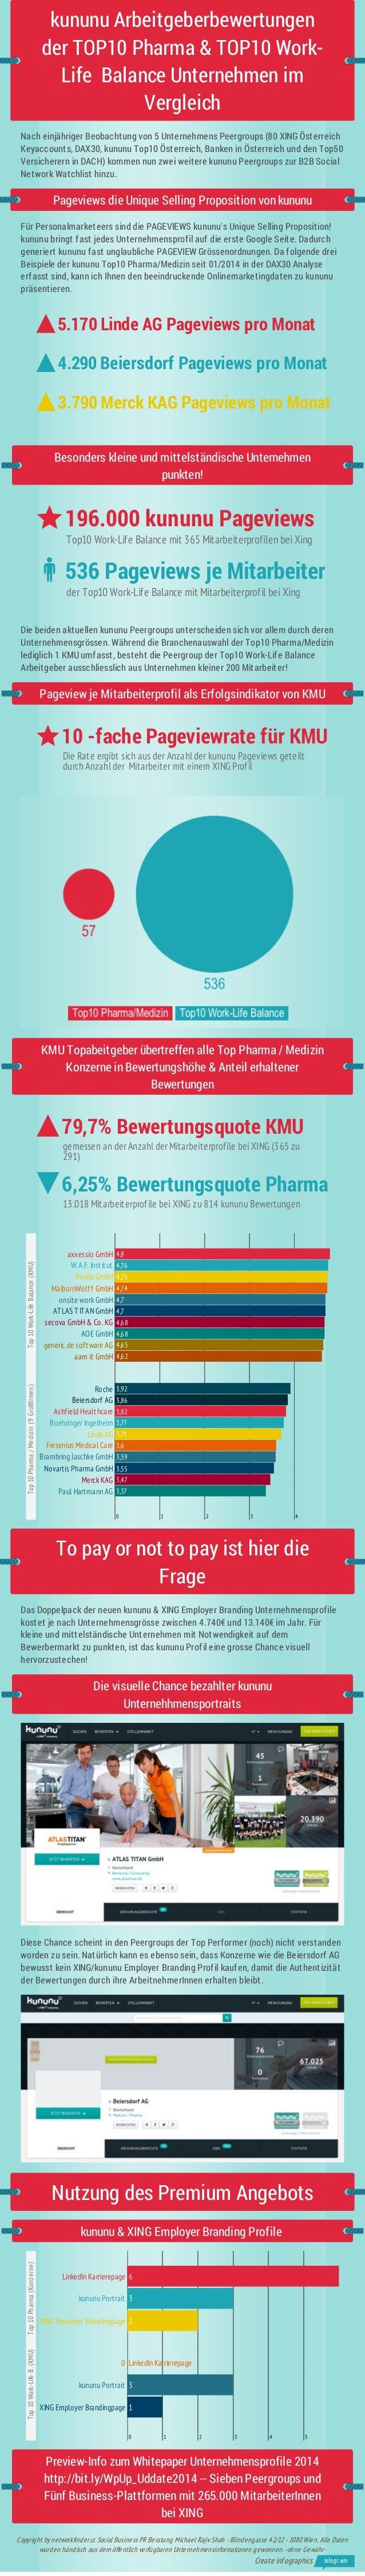 kununu Arbeitgeberbewertungen: Vergleich Top10 Pharma (Konzerne) vs. Work-Life-Balance (KMU)